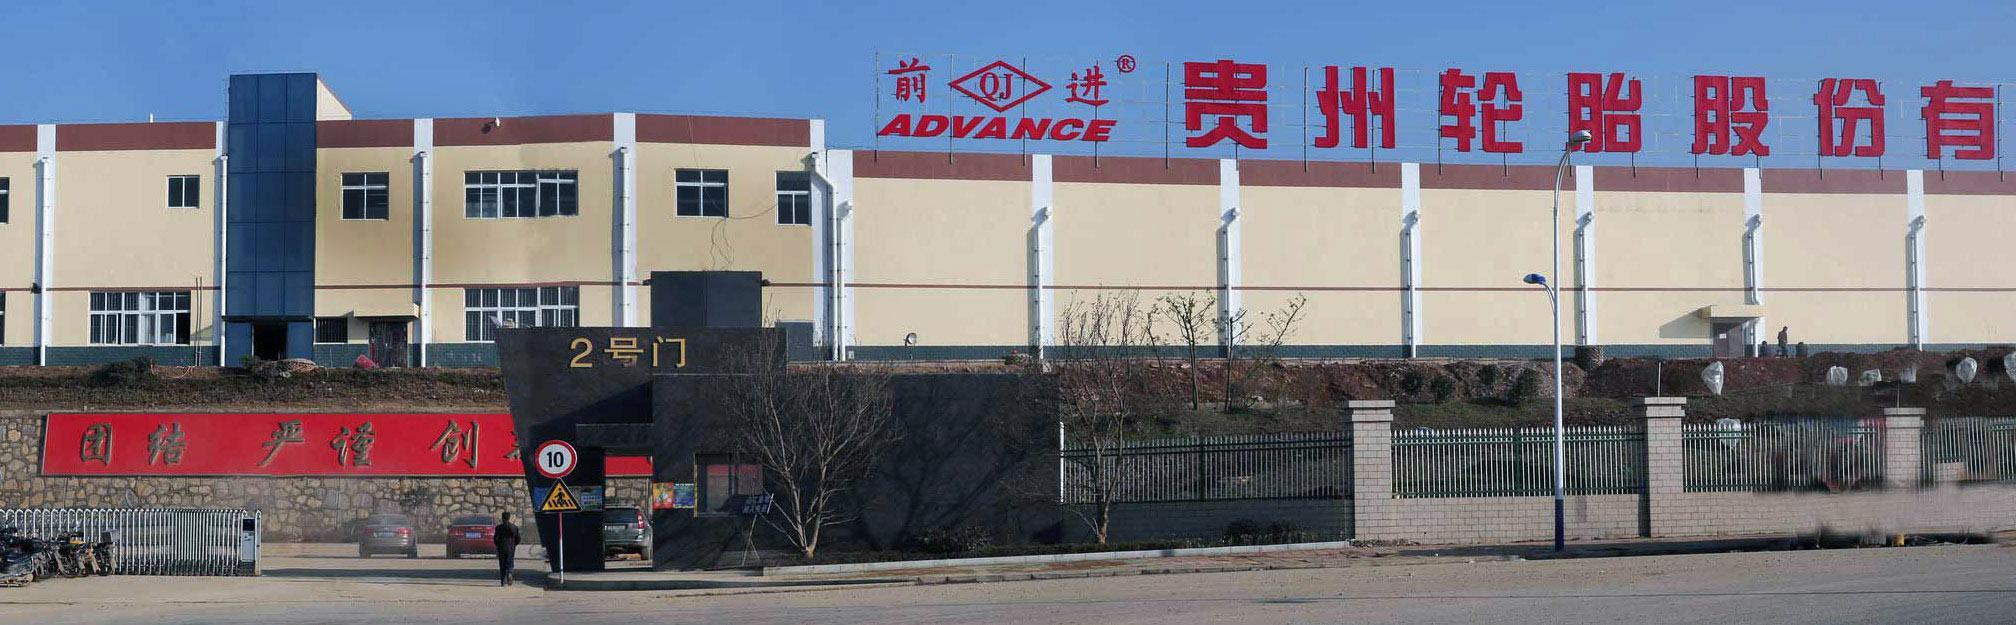 Guizhou Tyre намерена построить завод TBR-шин во Вьетнаме